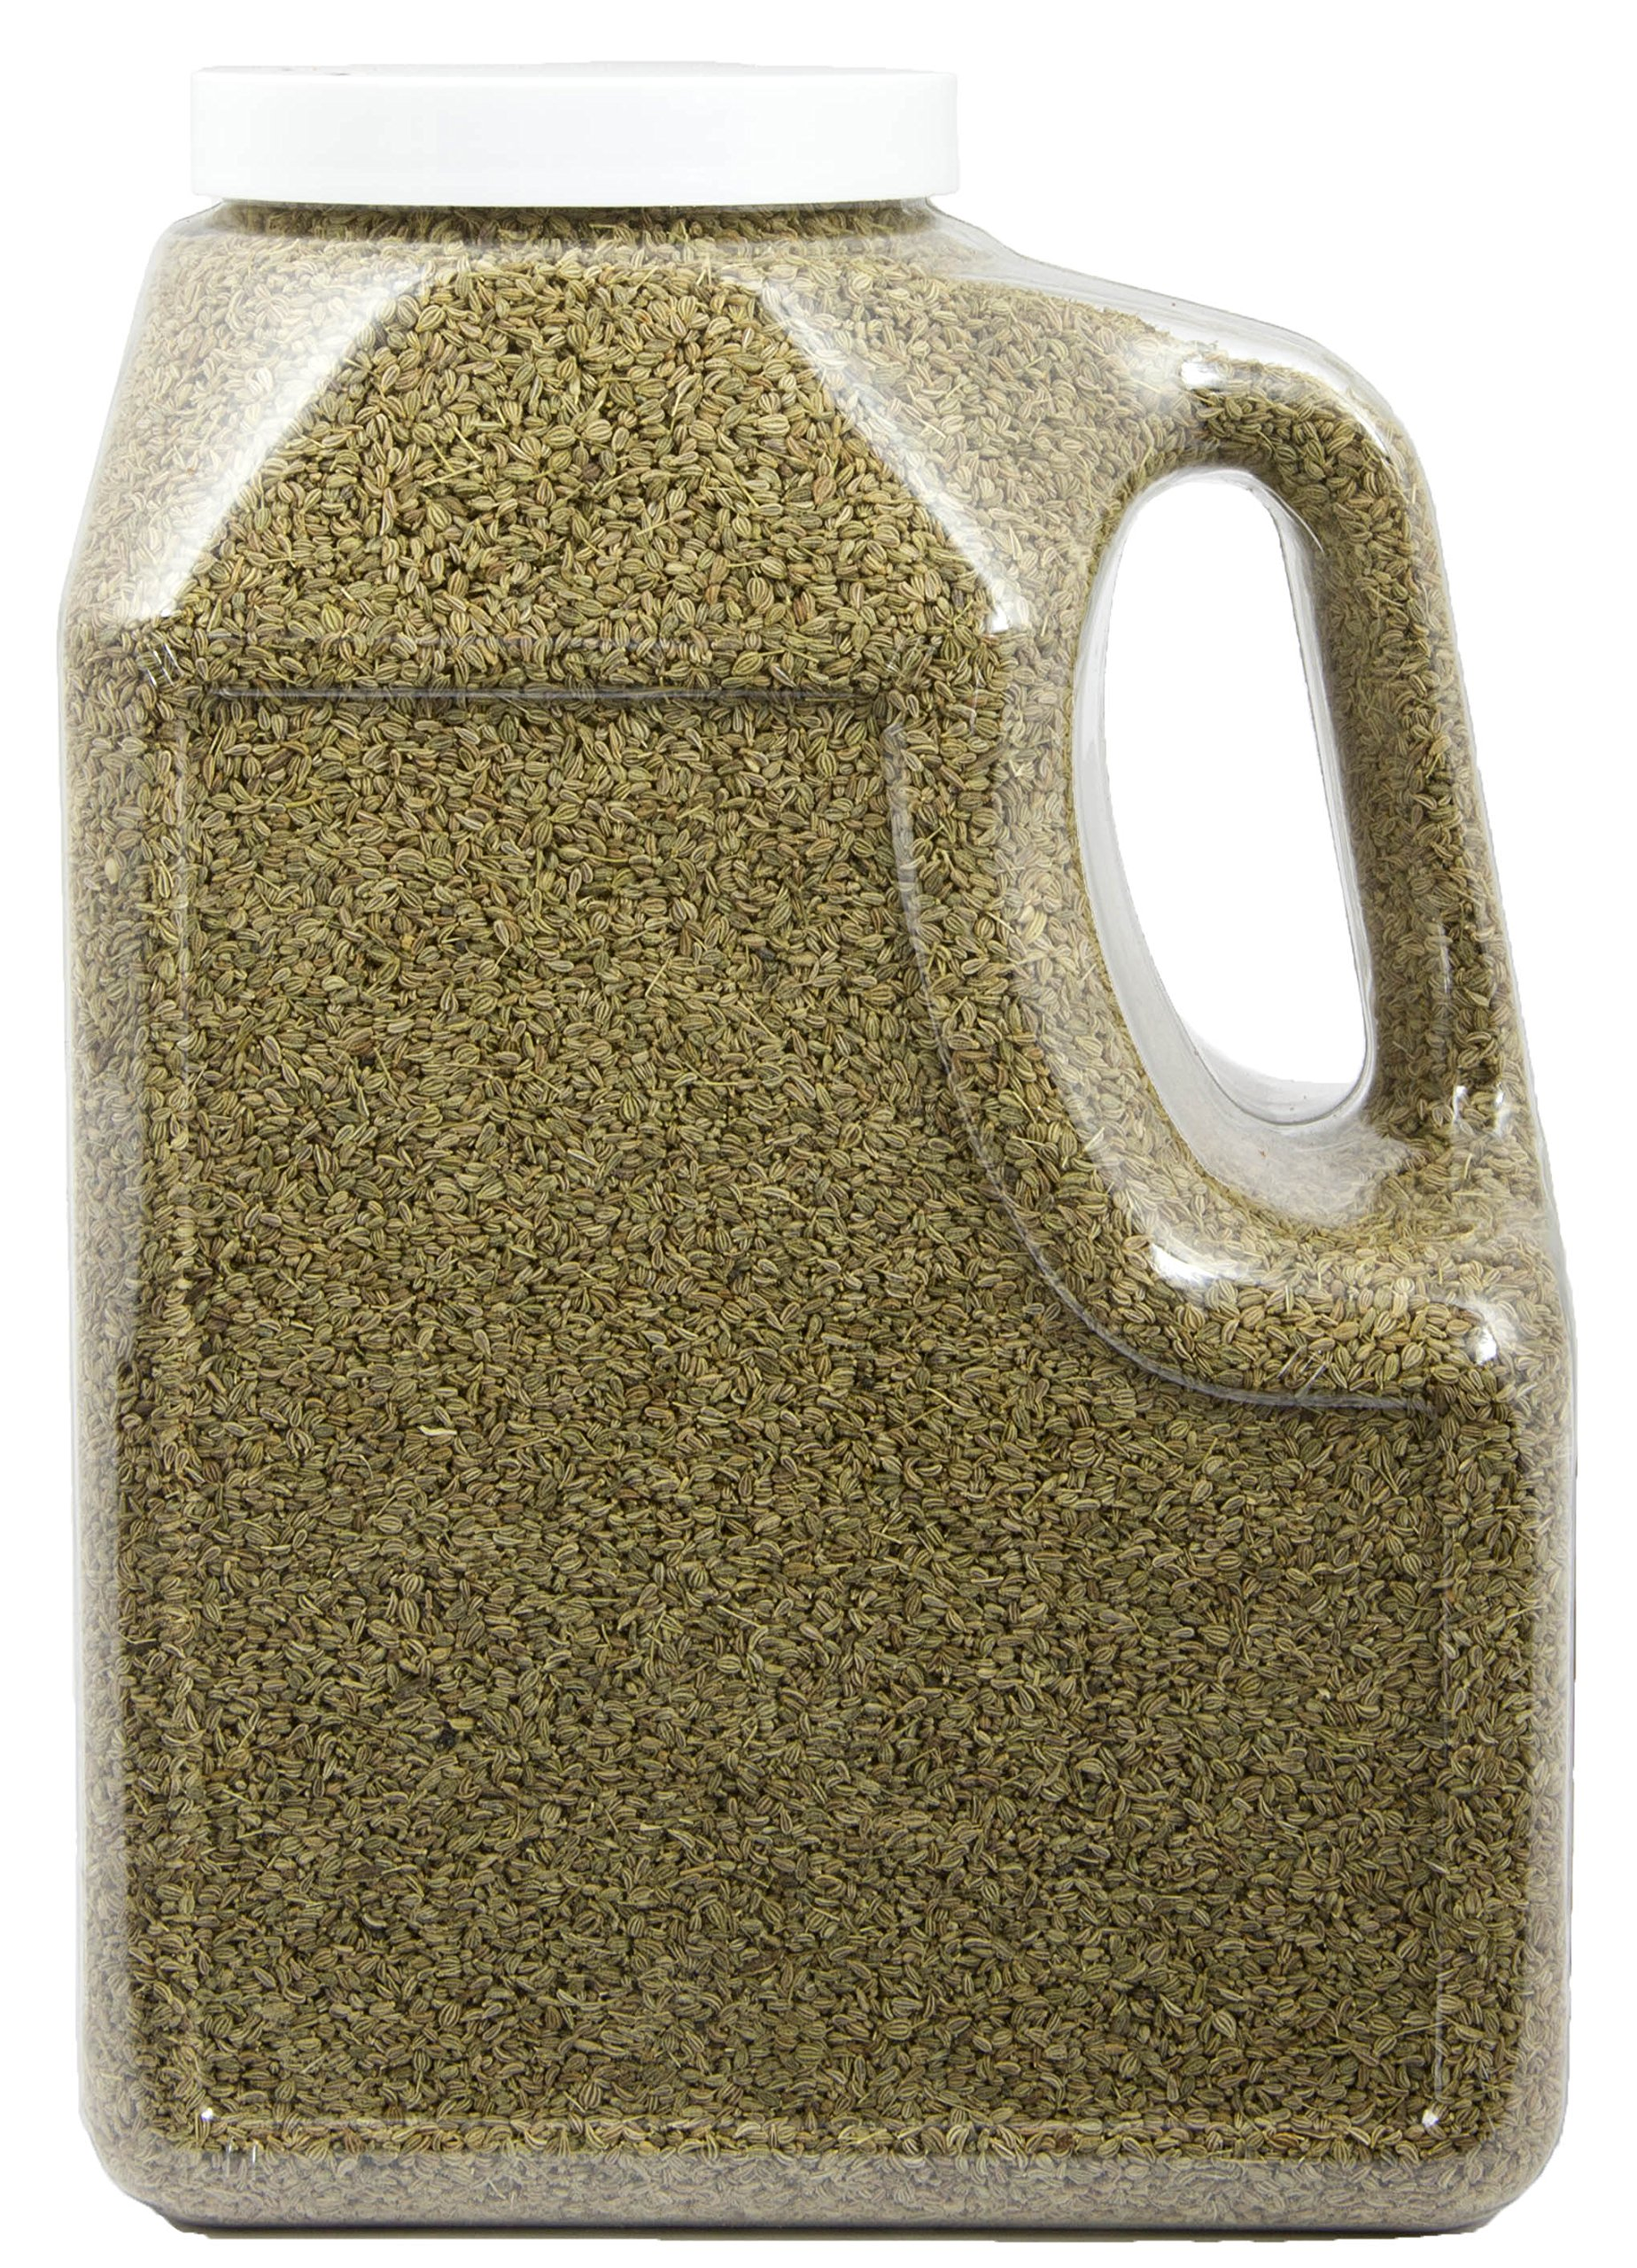 Ajwain Seeds : Whole Indian Spice Kosher (36oz.) by Burma Spice (Image #2)